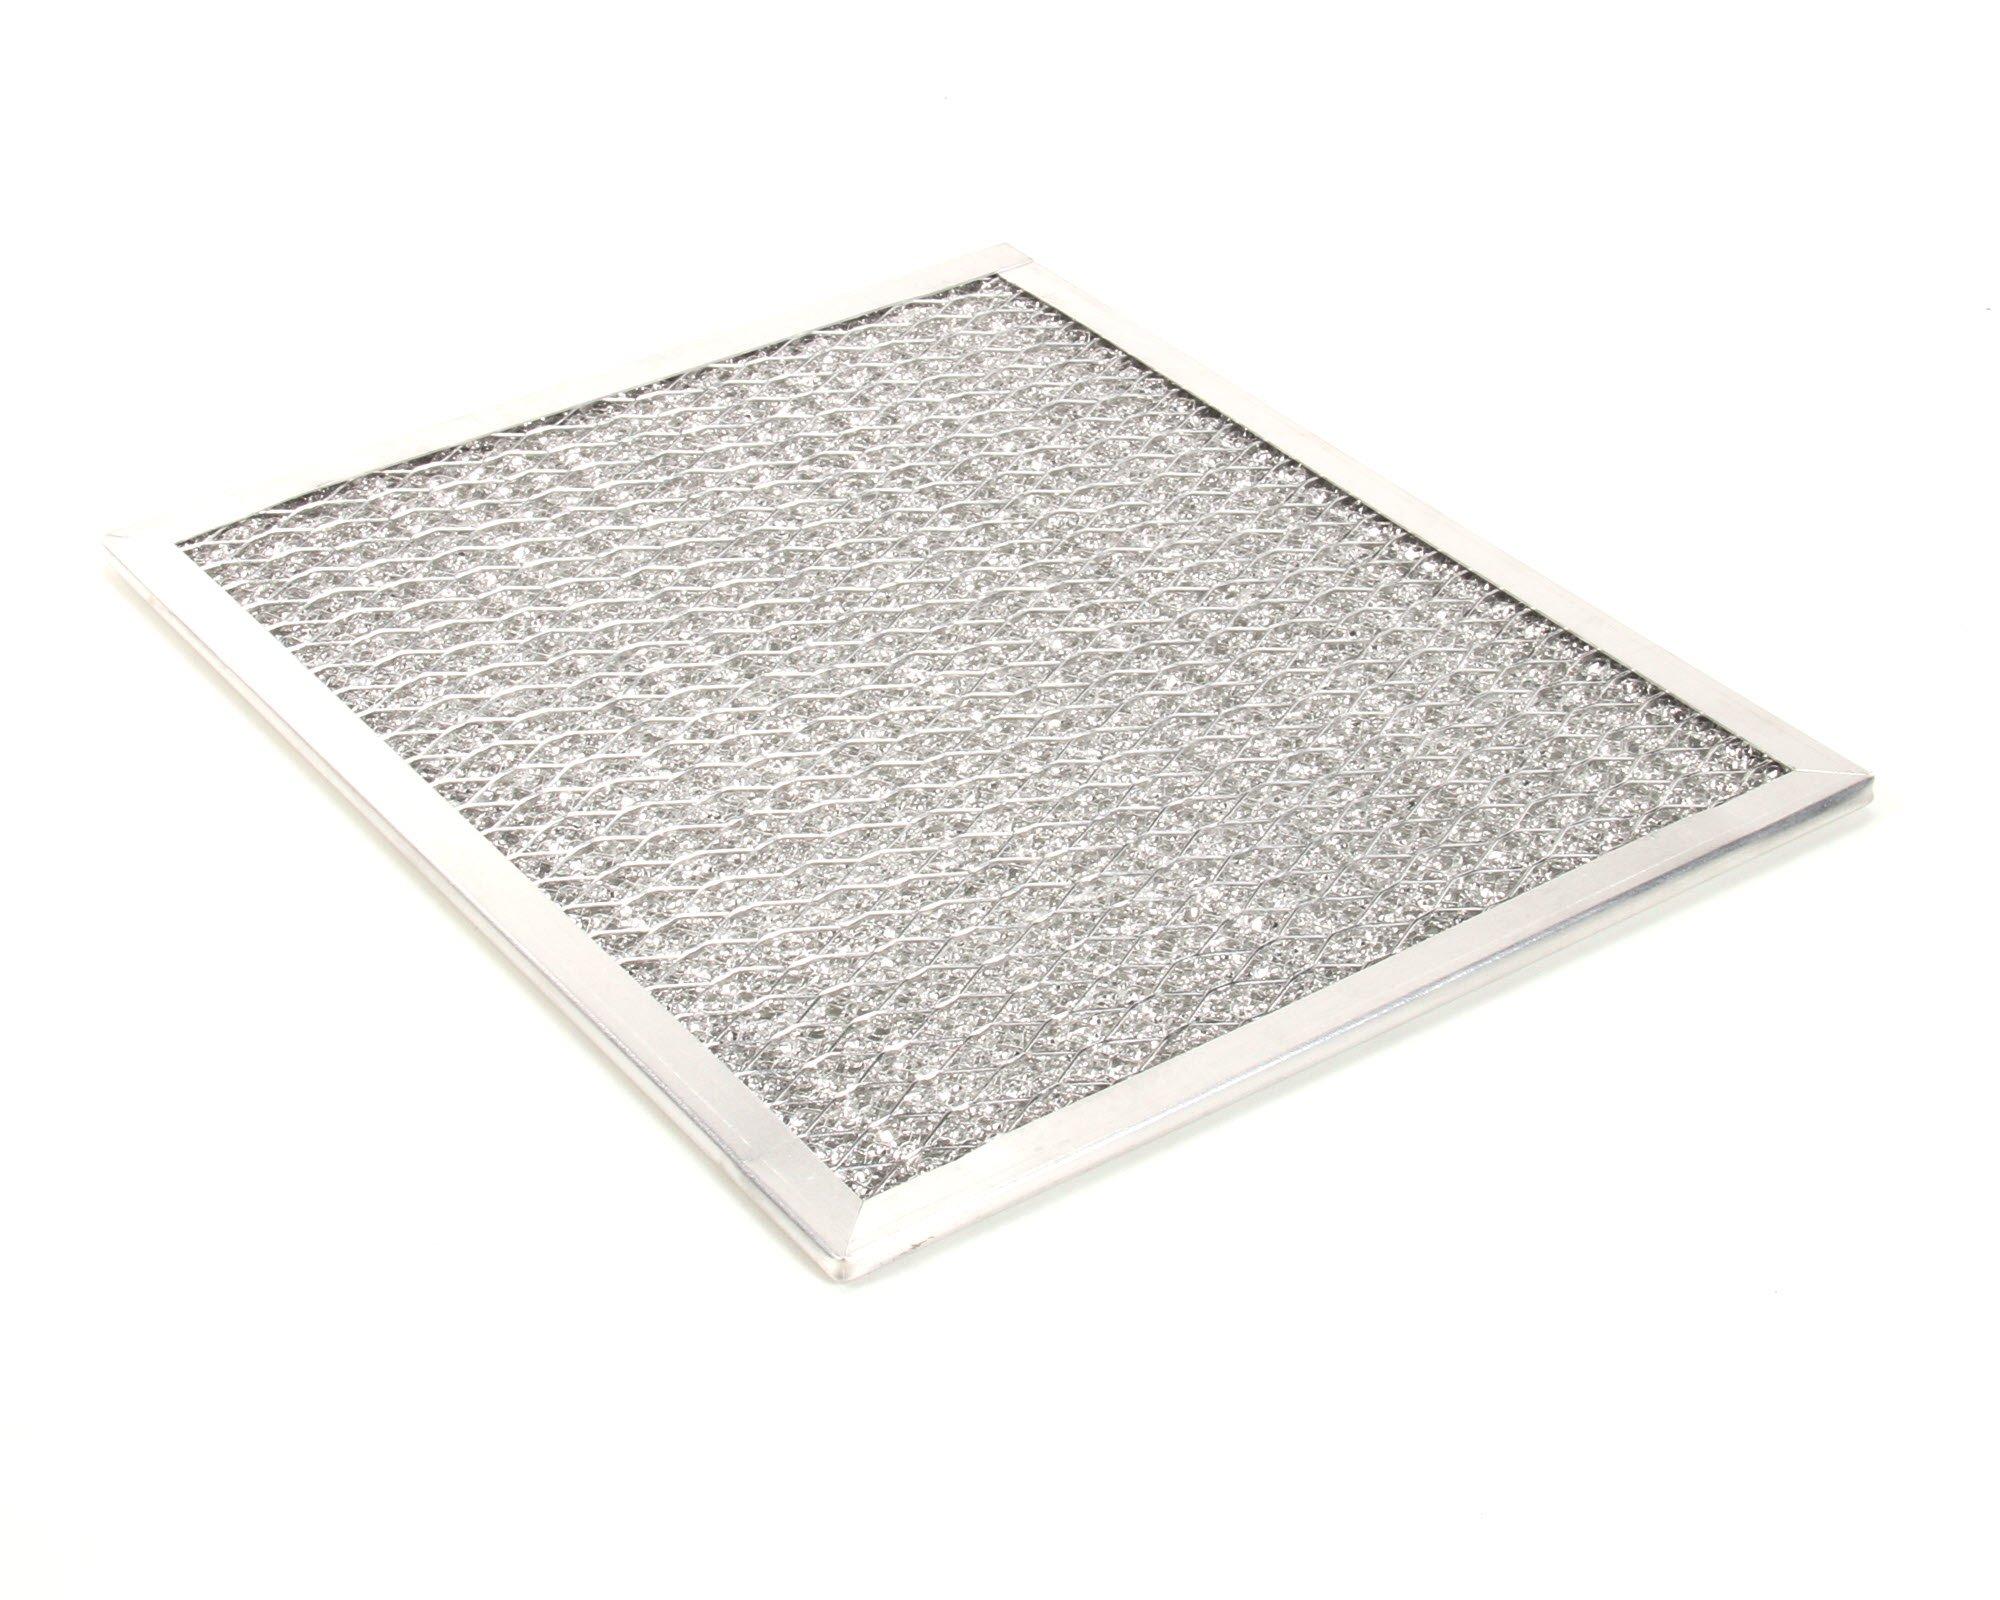 Traulsen 341-60062-05 13 x 10.563 Air Filter